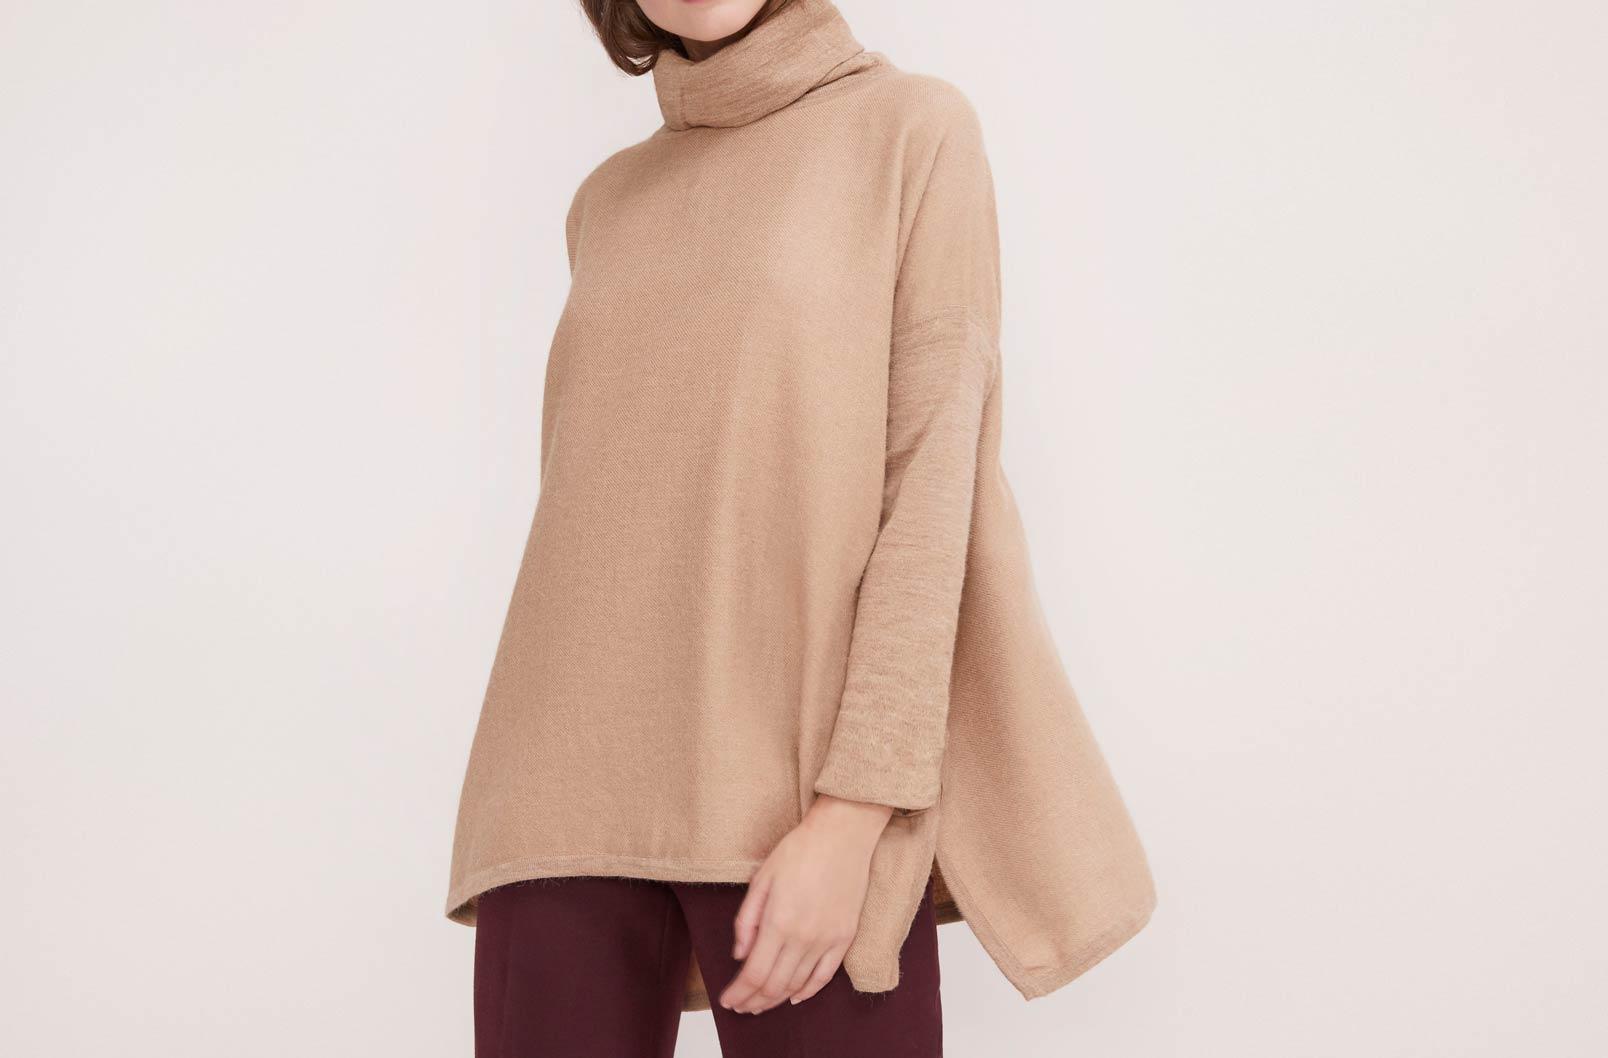 Model wearing Baby Alpaca Oversized Turtleneck Sweater